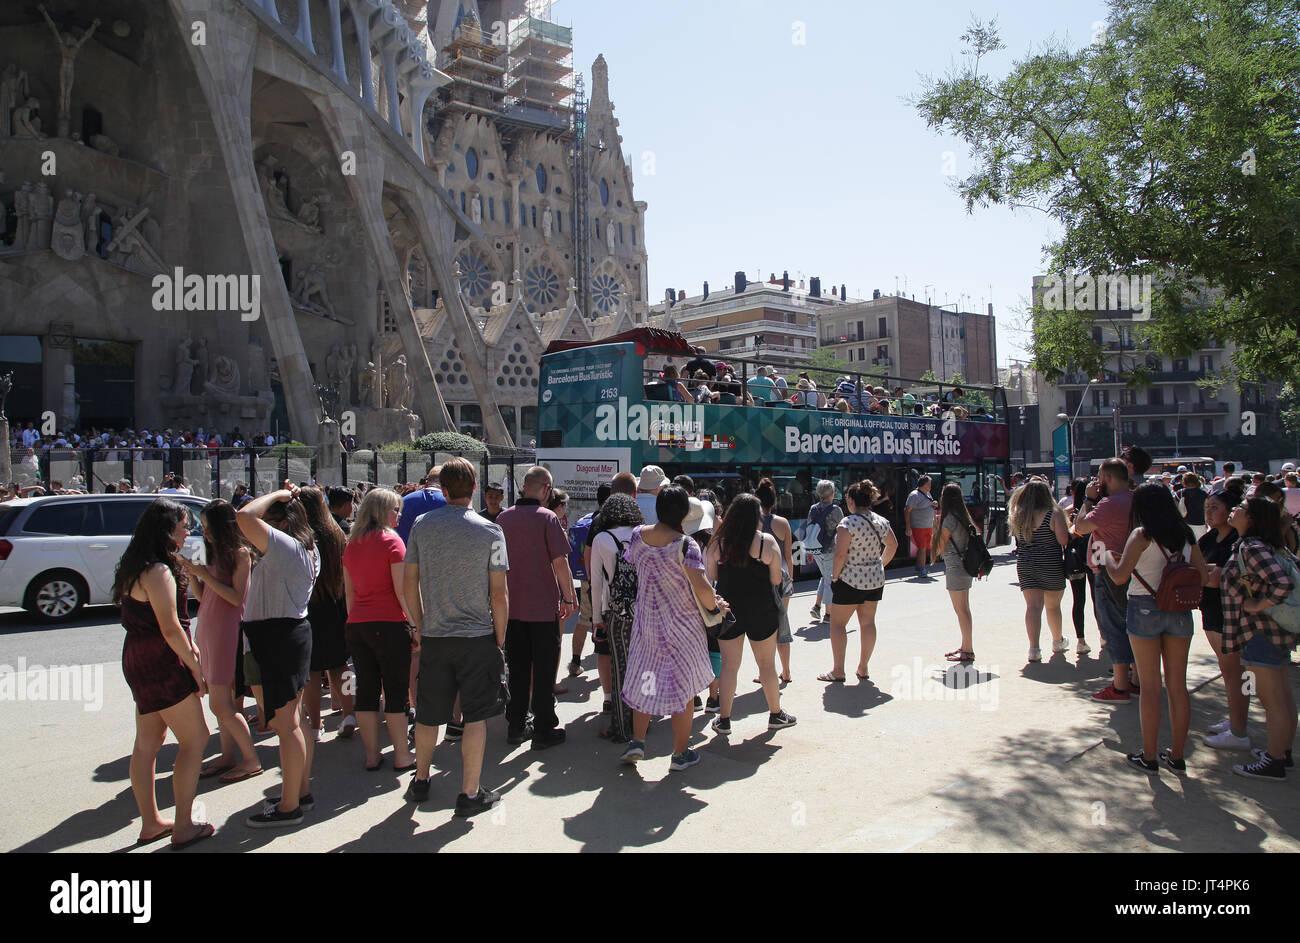 Barcelona mass tourism at La Sagrada Familia.Spain - Stock Image